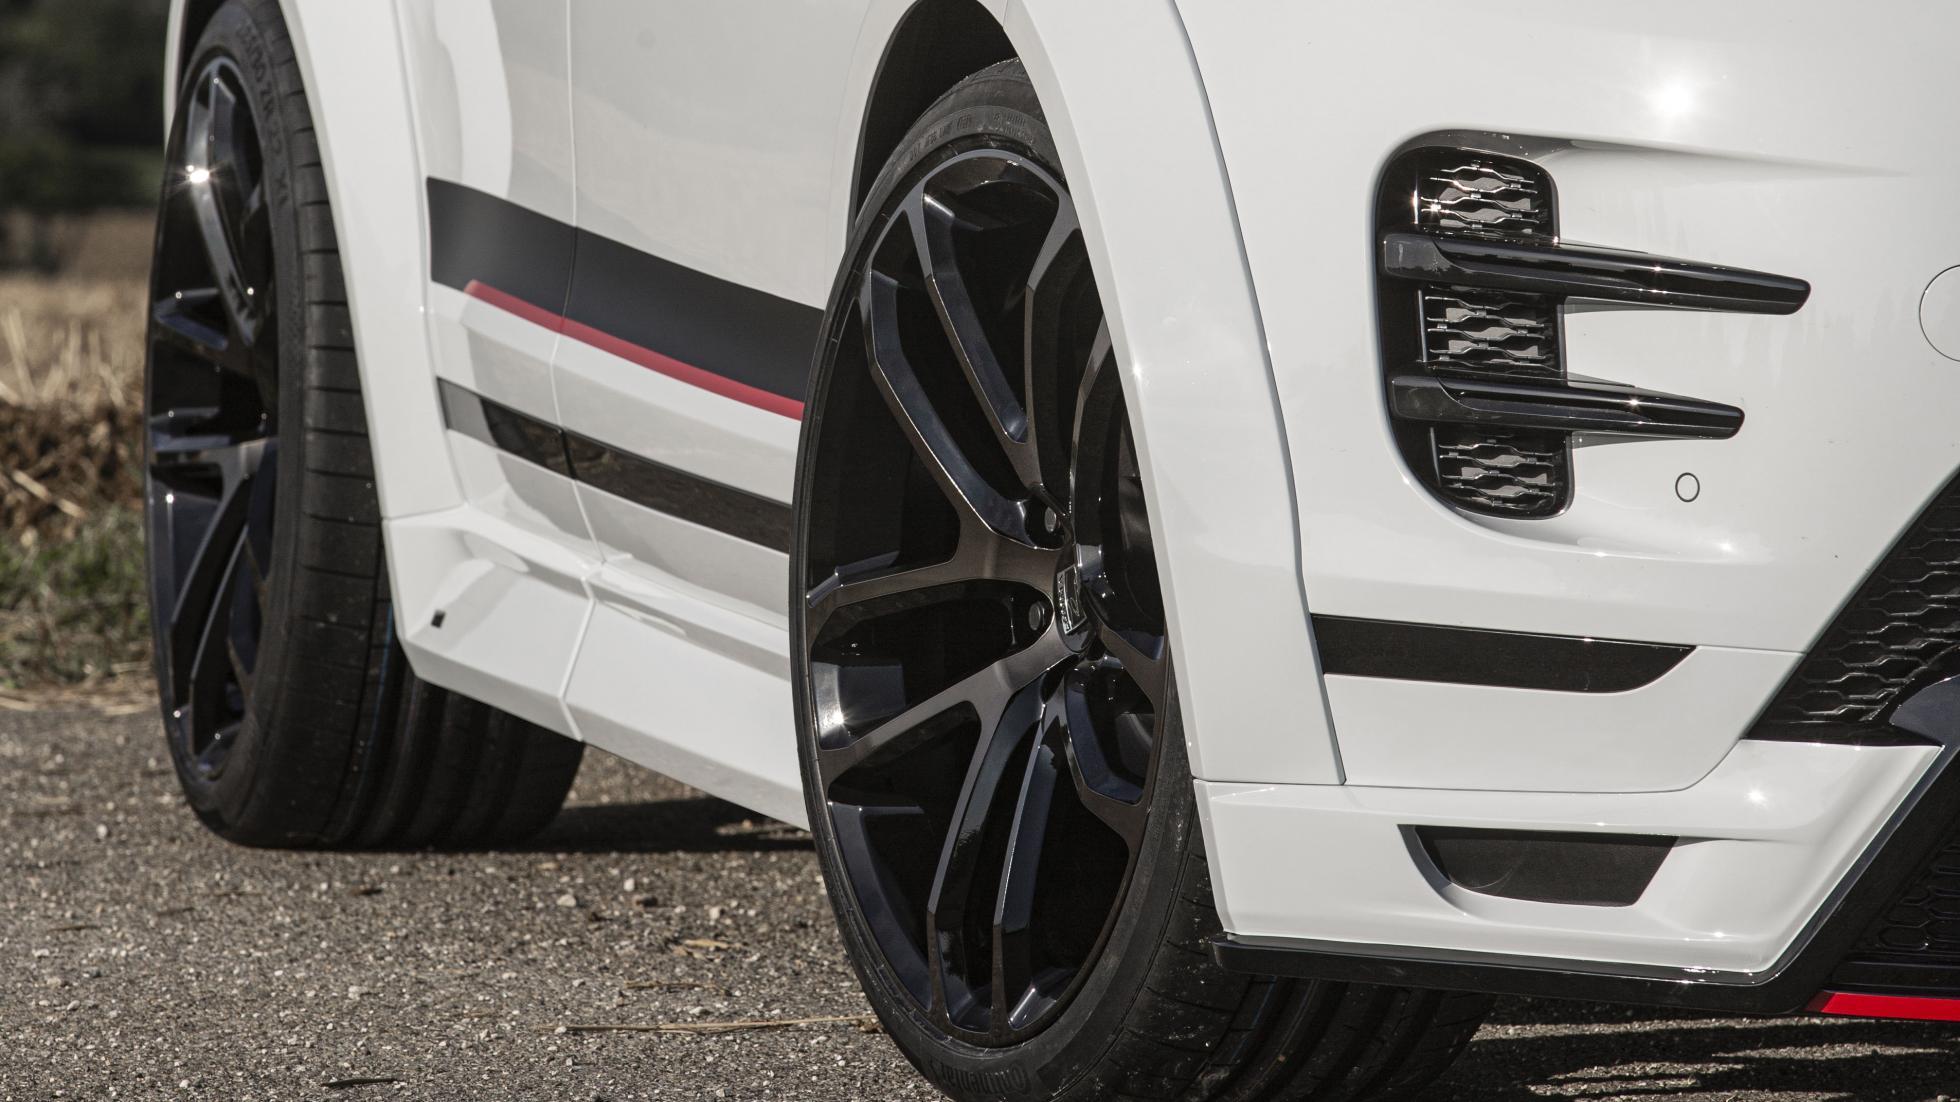 Range-Rover-Evoque-by-Lumma-Design-13